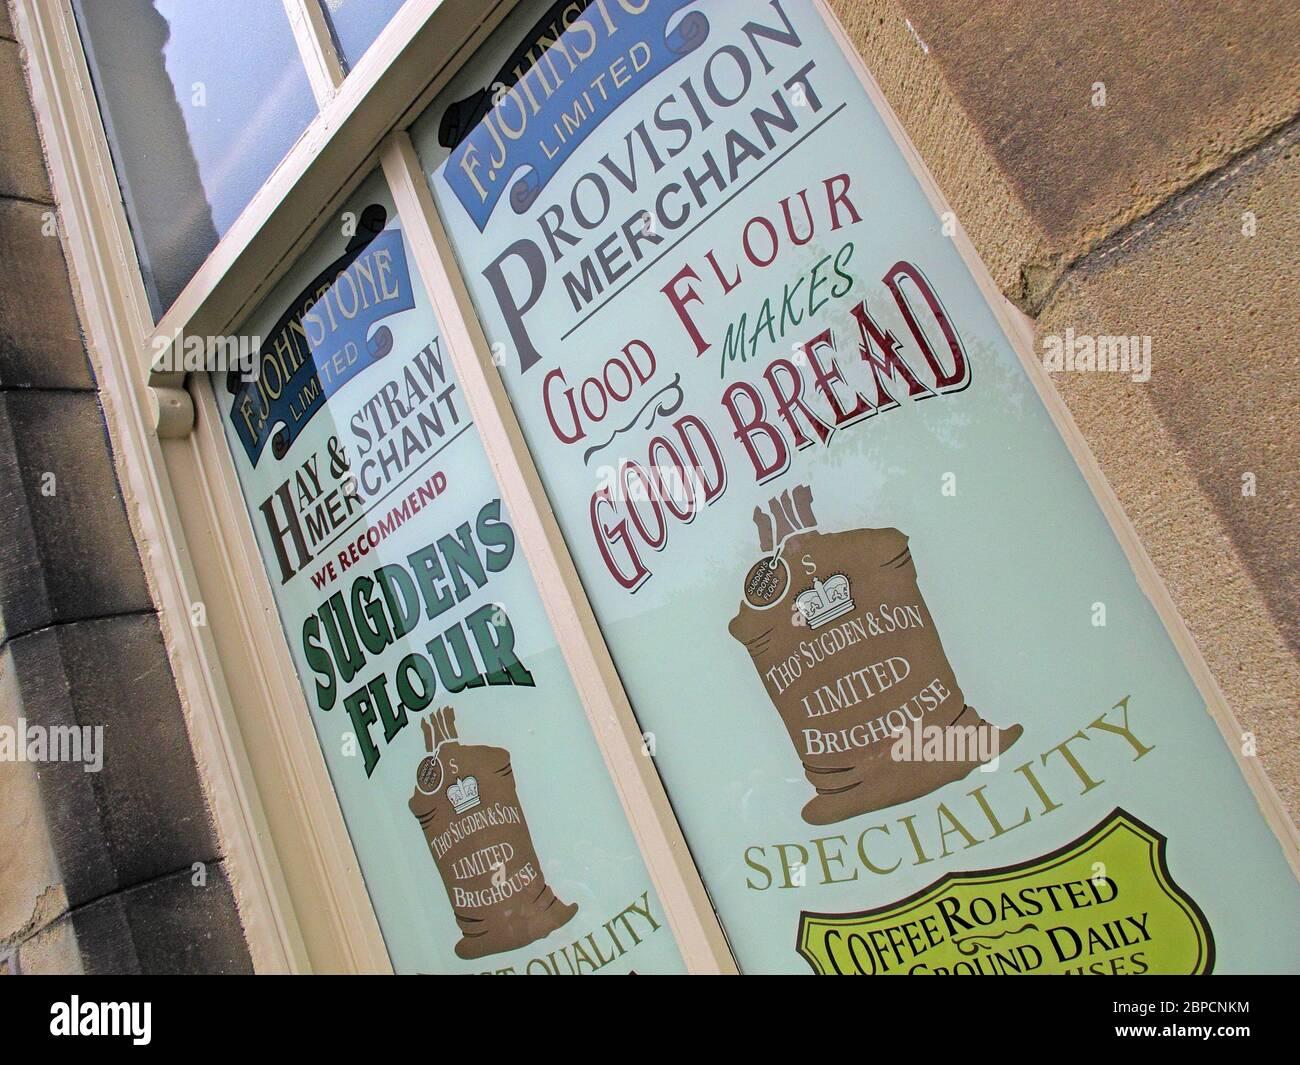 Dieses Stockfoto: F Johnston Limited, Provision Merchants, Brighouse, West Yorkshire, England, Großbritannien - 2BPCNK